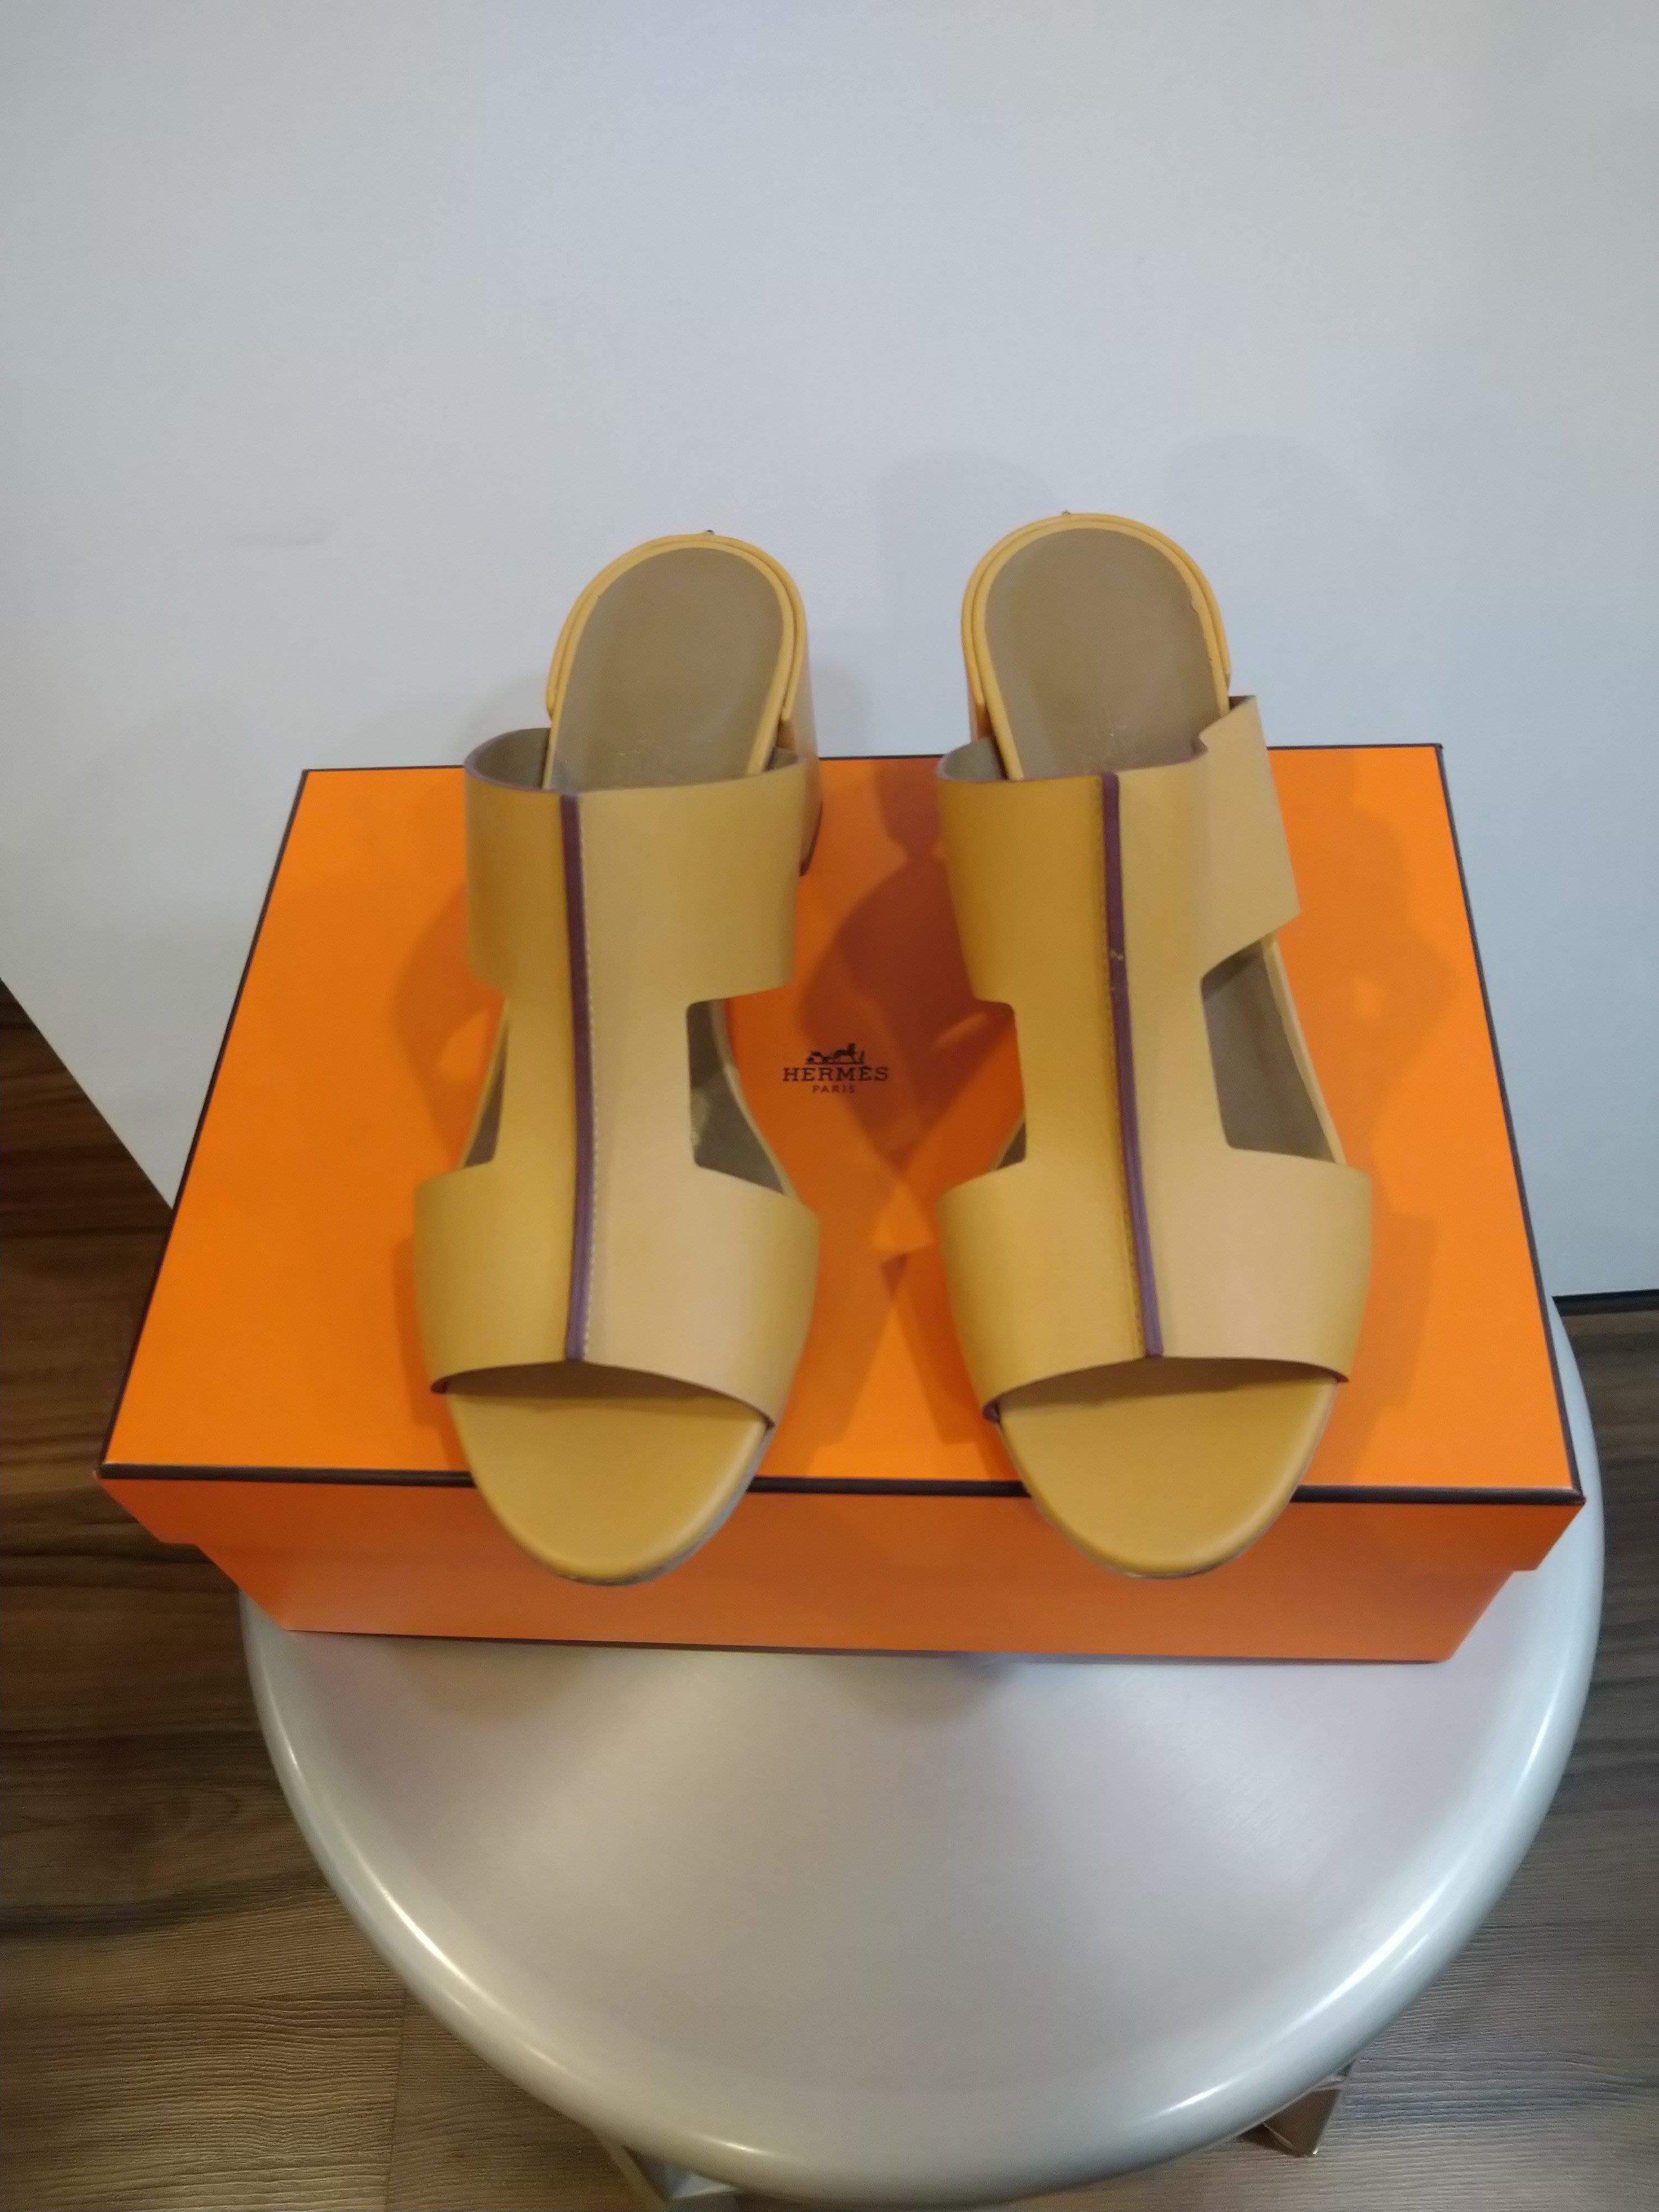 Hermes淡駝色小牛皮H經典款粗跟涼鞋(38.5號)~~全新品己貼底